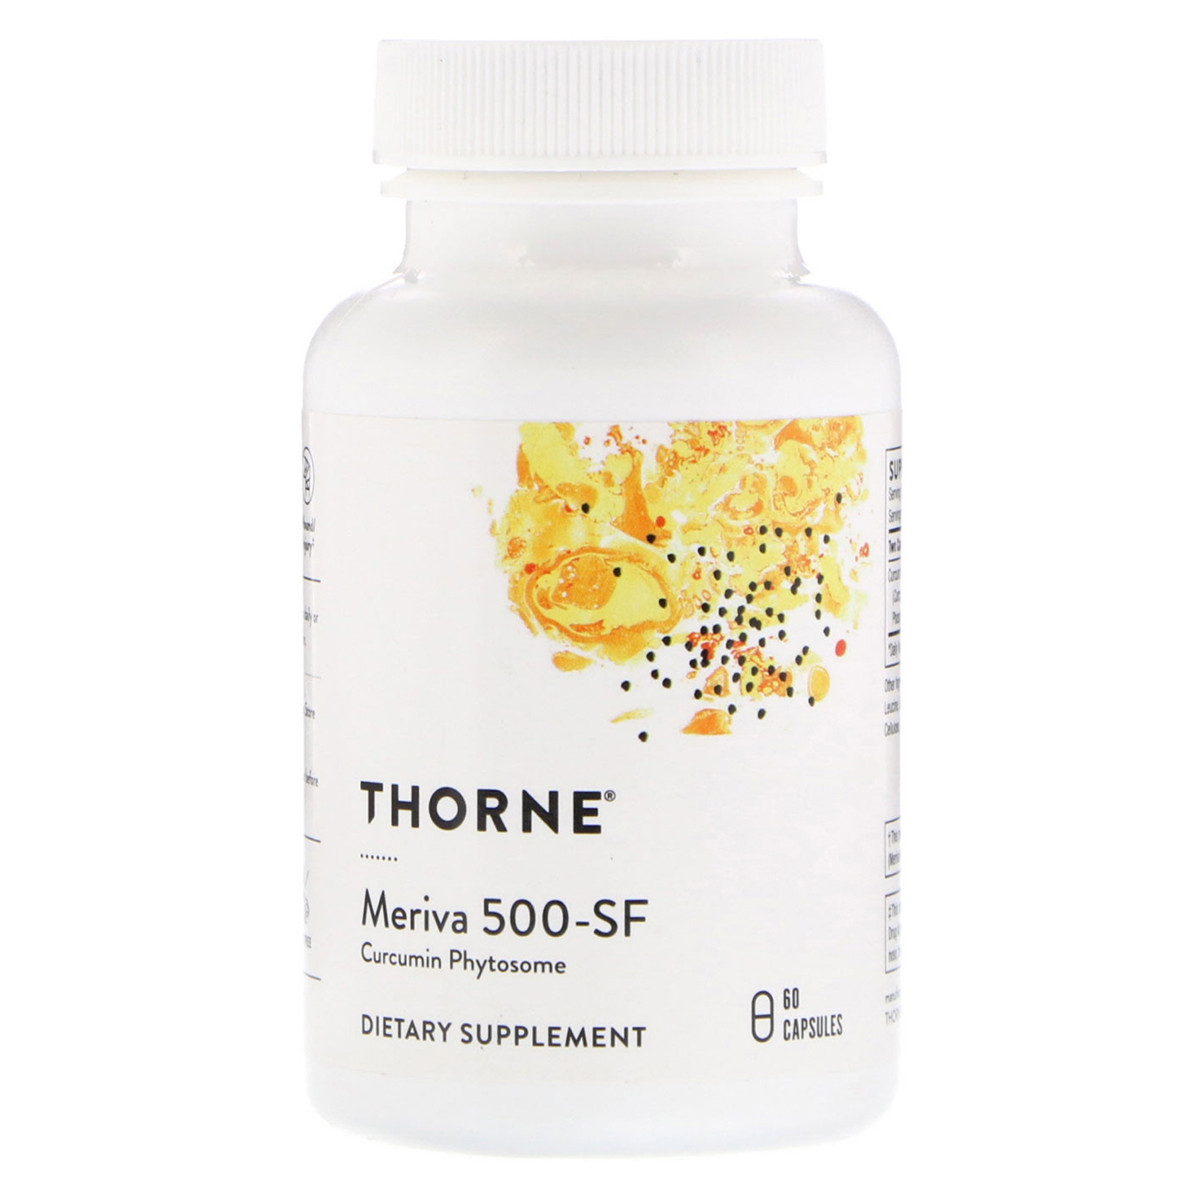 Фитосомы Куркумина 500-SF, Curcumin Phytosome Meriva, Thorne Research, 60 гелевых капсул